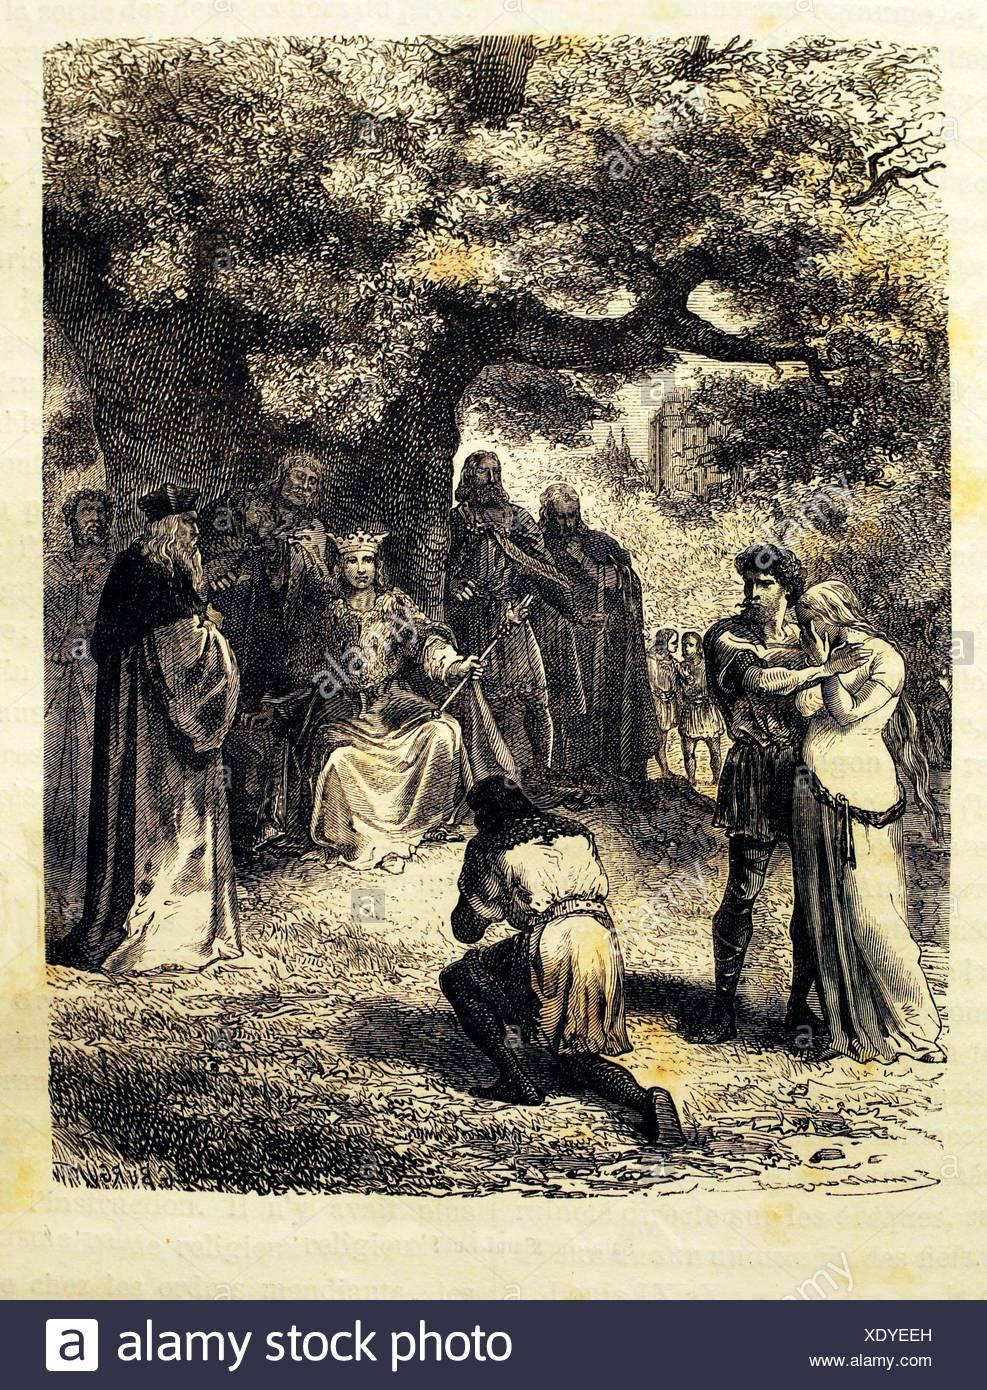 Saint Louis dispensing justice 12th century France - Stock Image